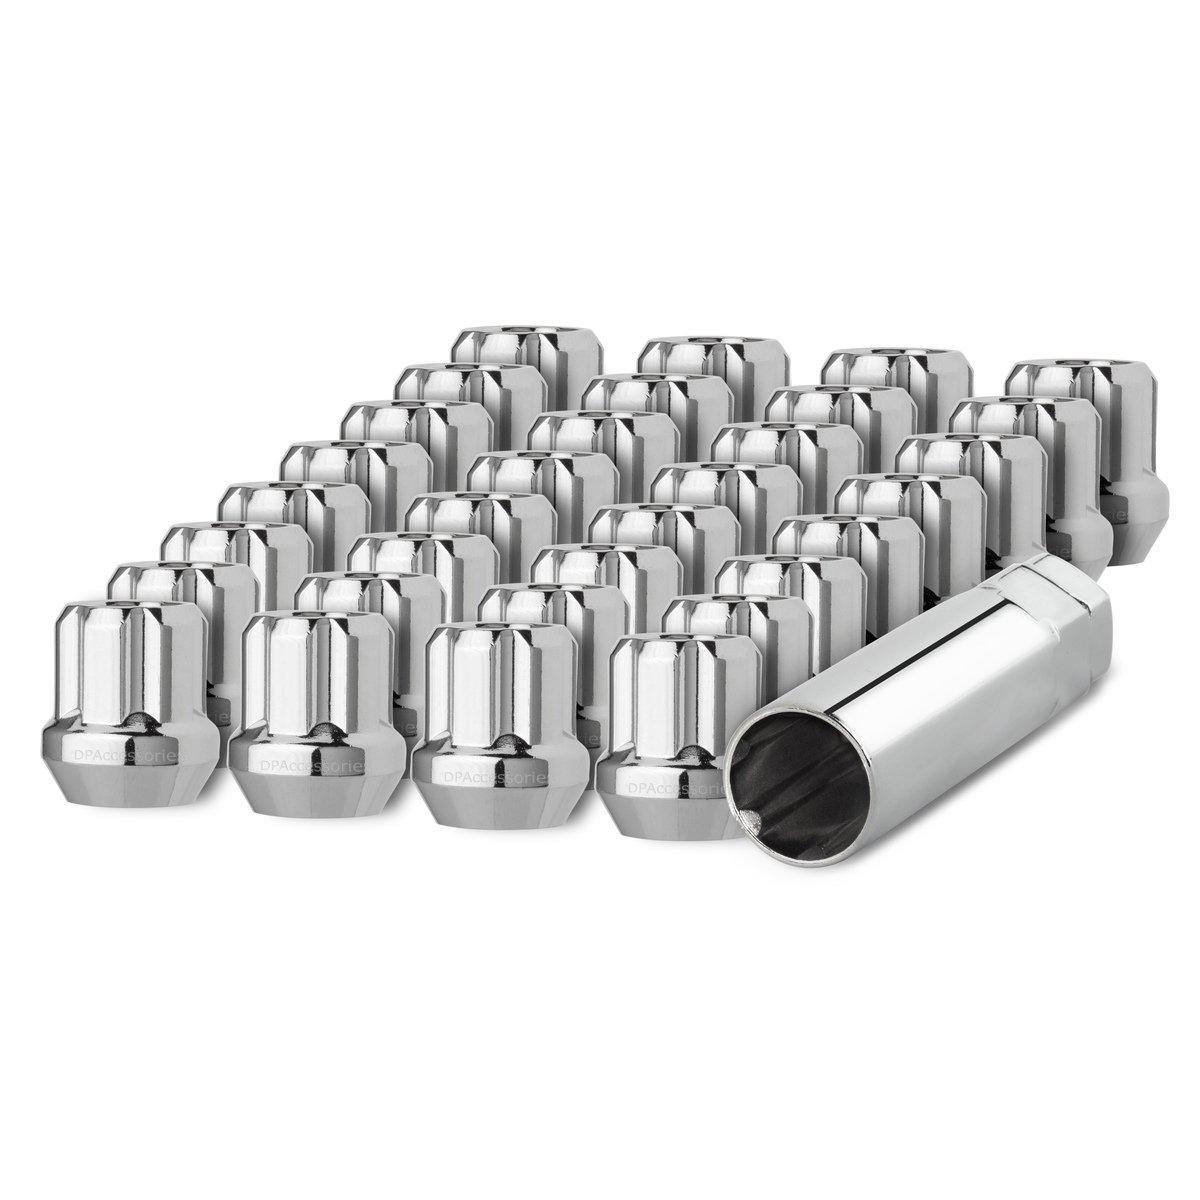 DPAccessories LOS2B8HC-CH04032 32 Chrome 14x1.5 Open End Duplex Spline Tuner Lug Nuts for Aftermarket Wheels Wheel Lug Nut